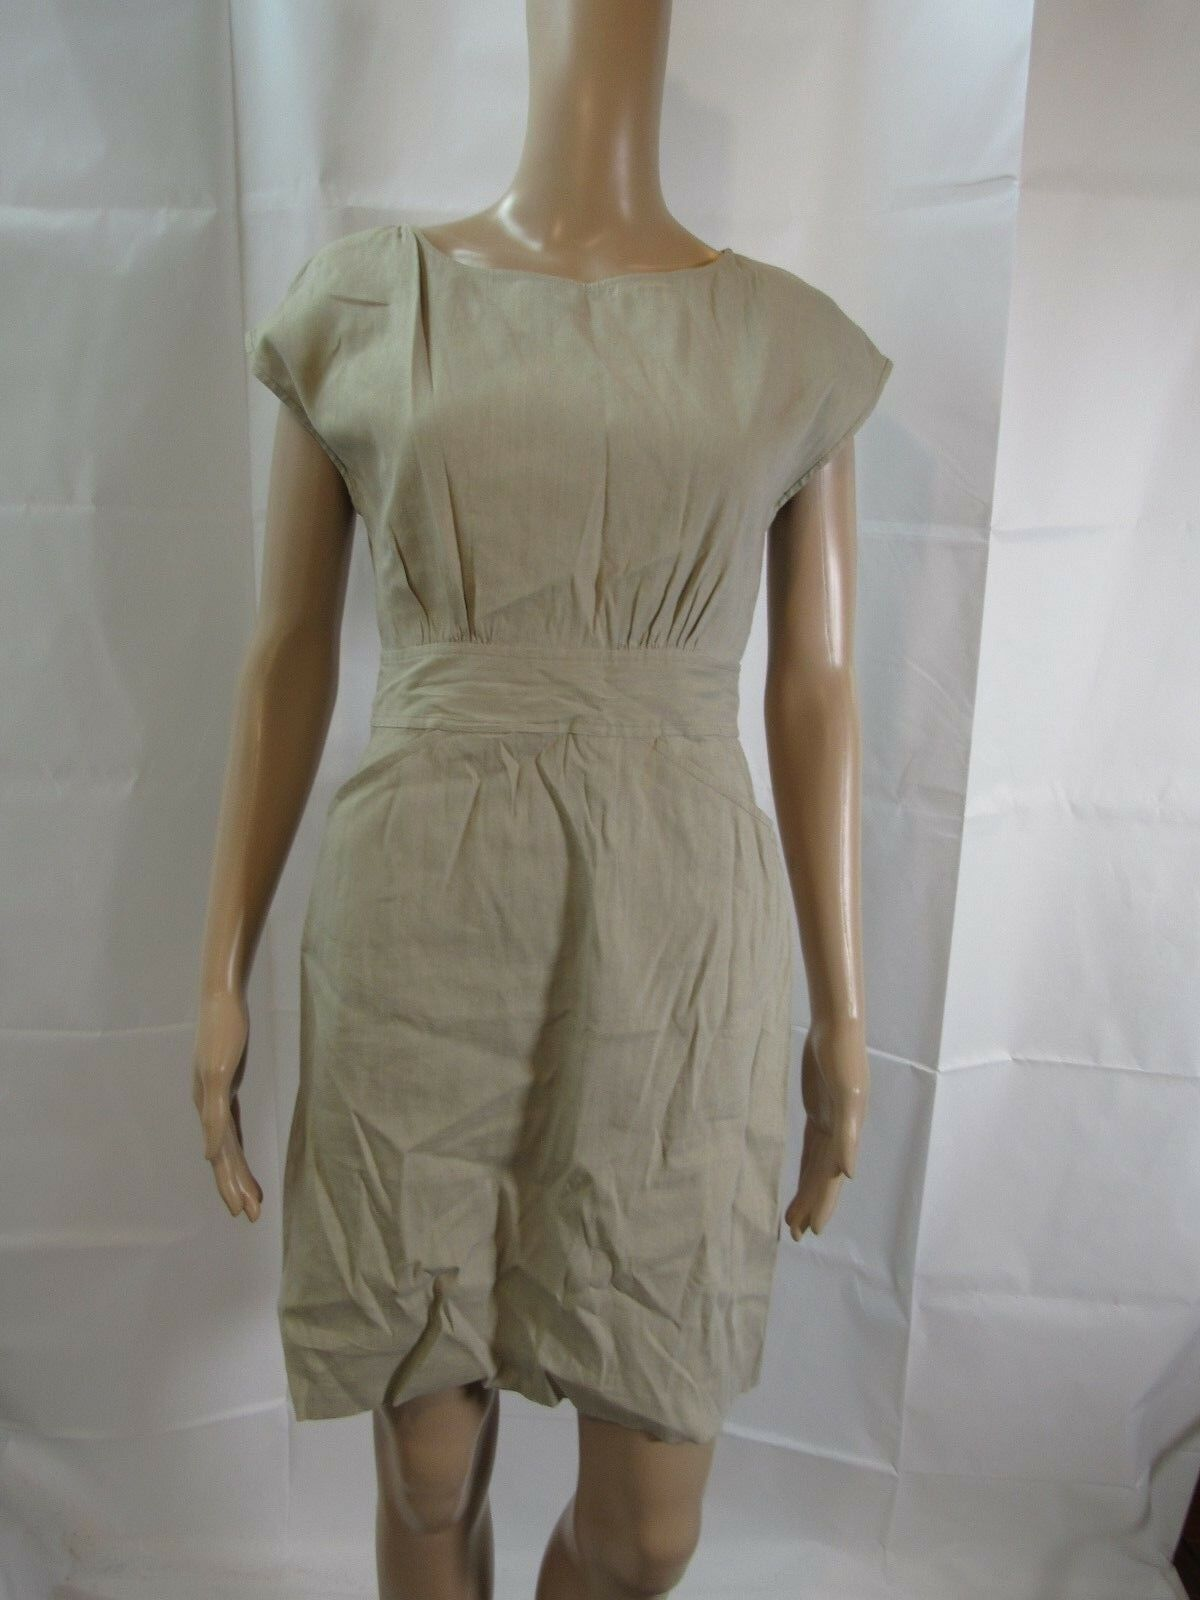 Theory Sleeveless Tan Dress Size 2